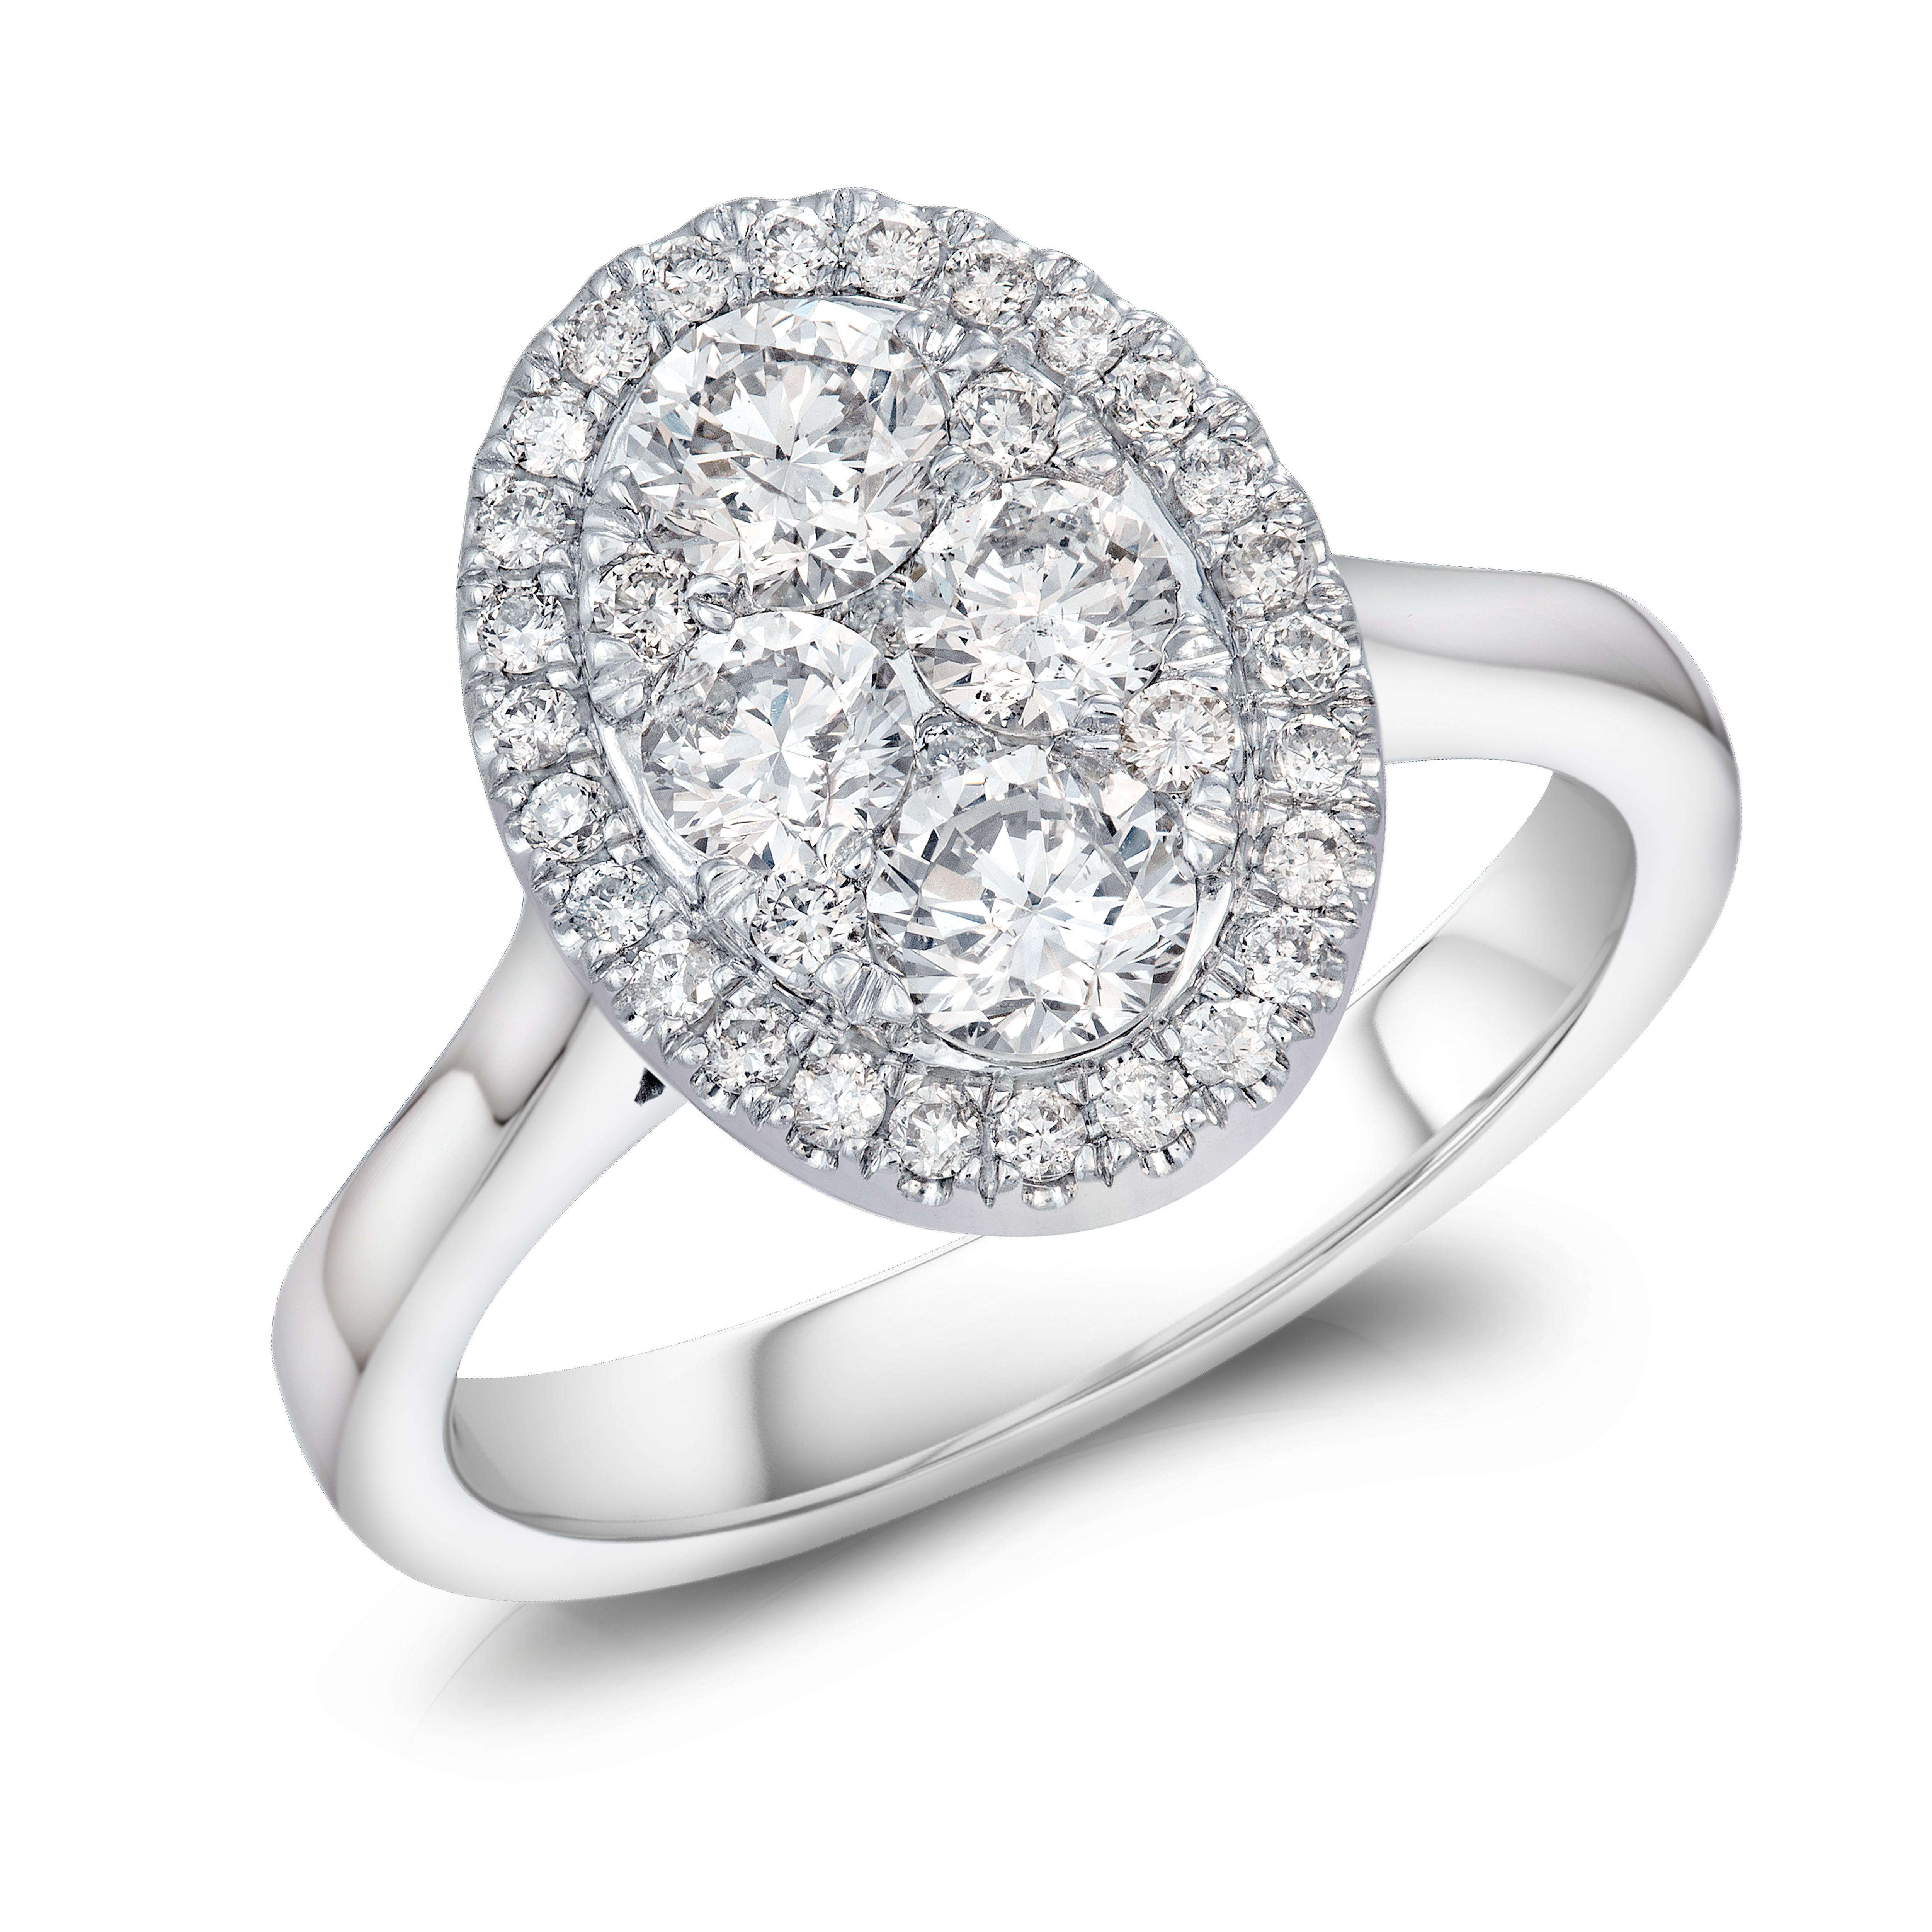 18CT WHITE GOLD OVAL REVERIE DIAMOND RING 1.00CT DIAMOND